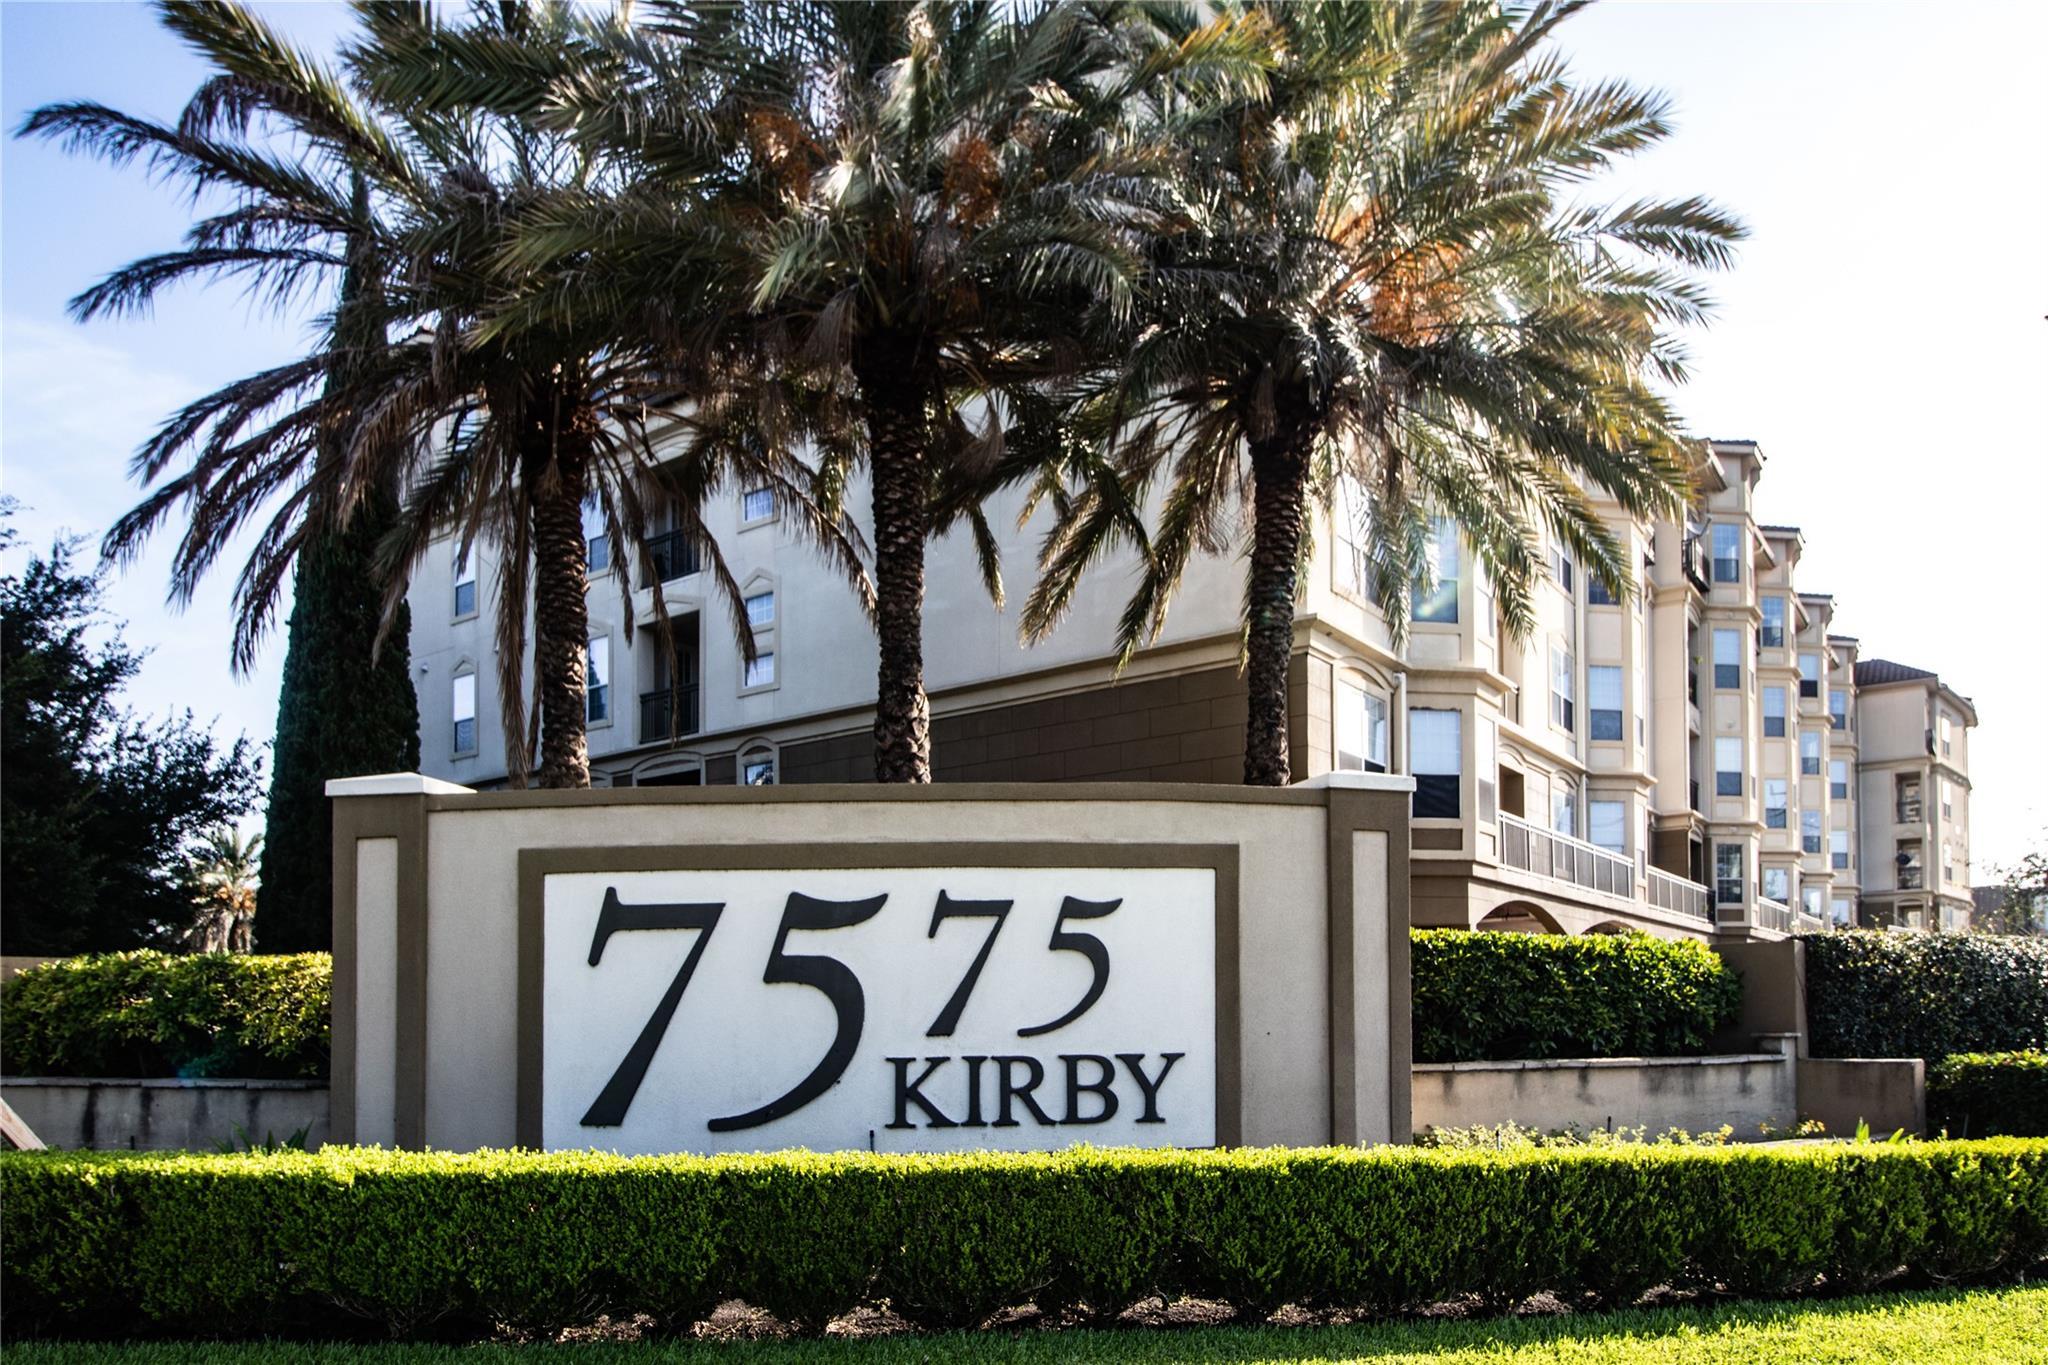 7575 Kirby Condo Real Estate Listings Main Image